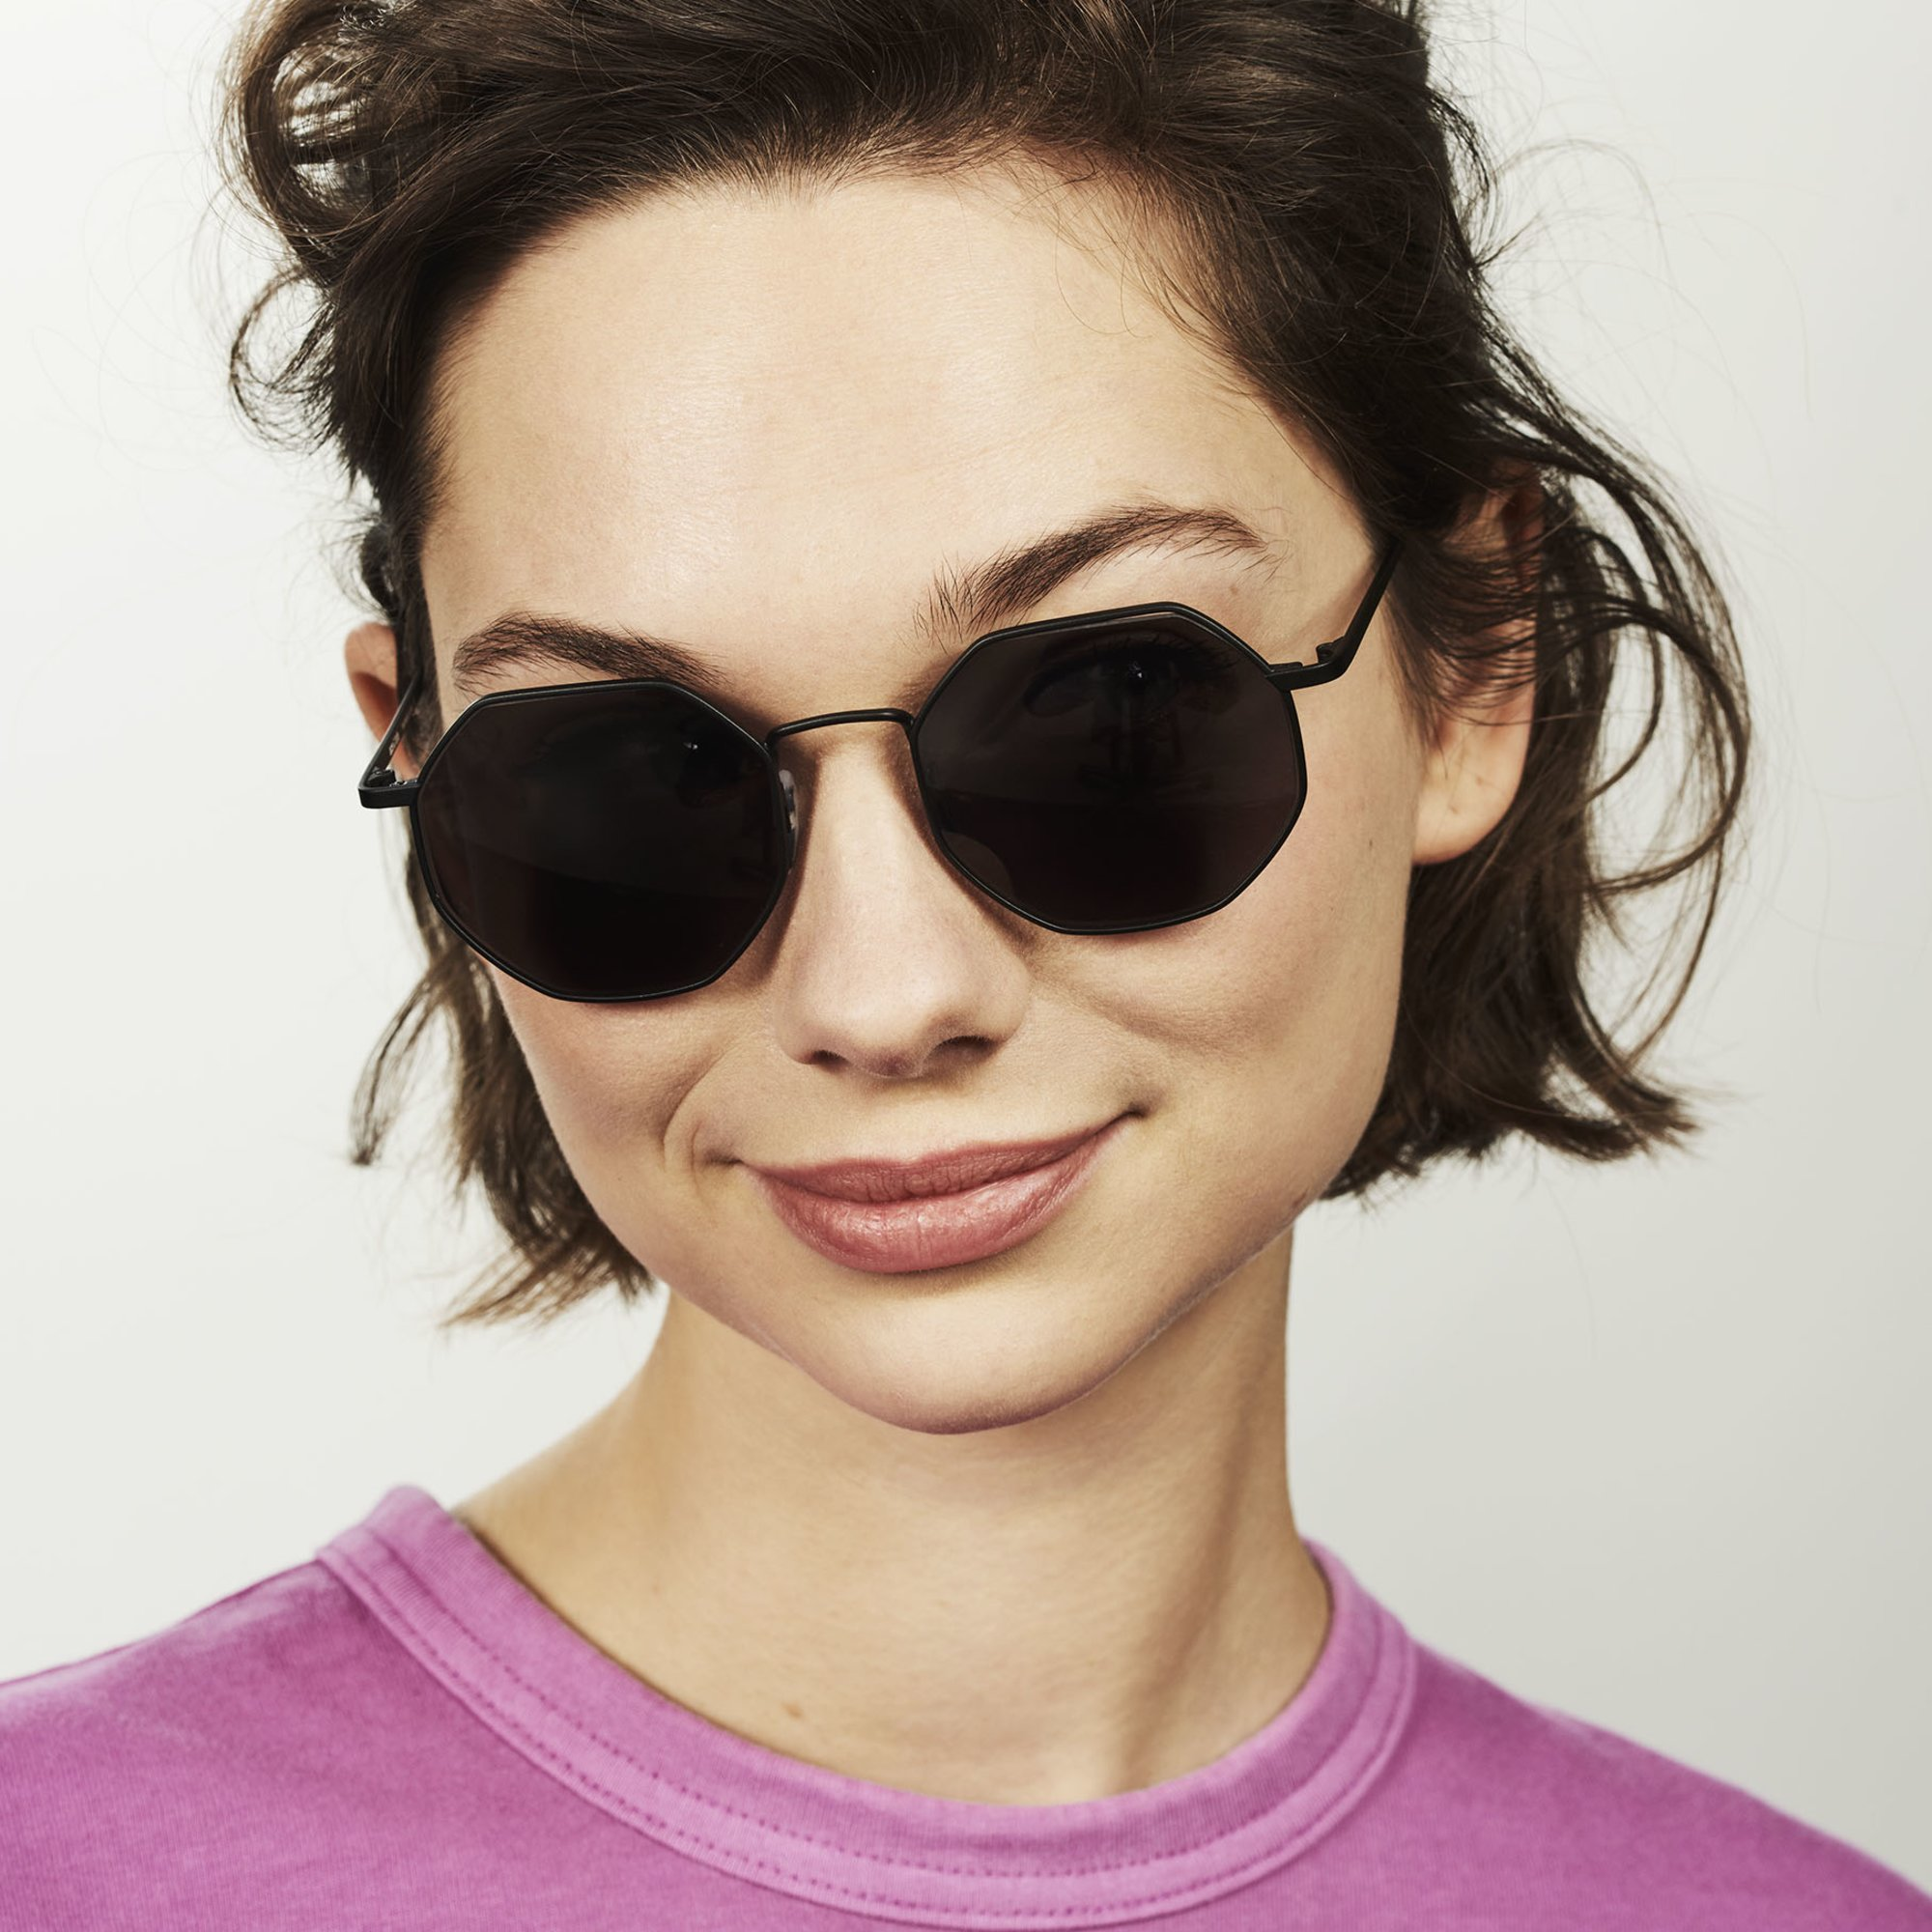 Ace & Tate Sunglasses |  Metall in Schwarz